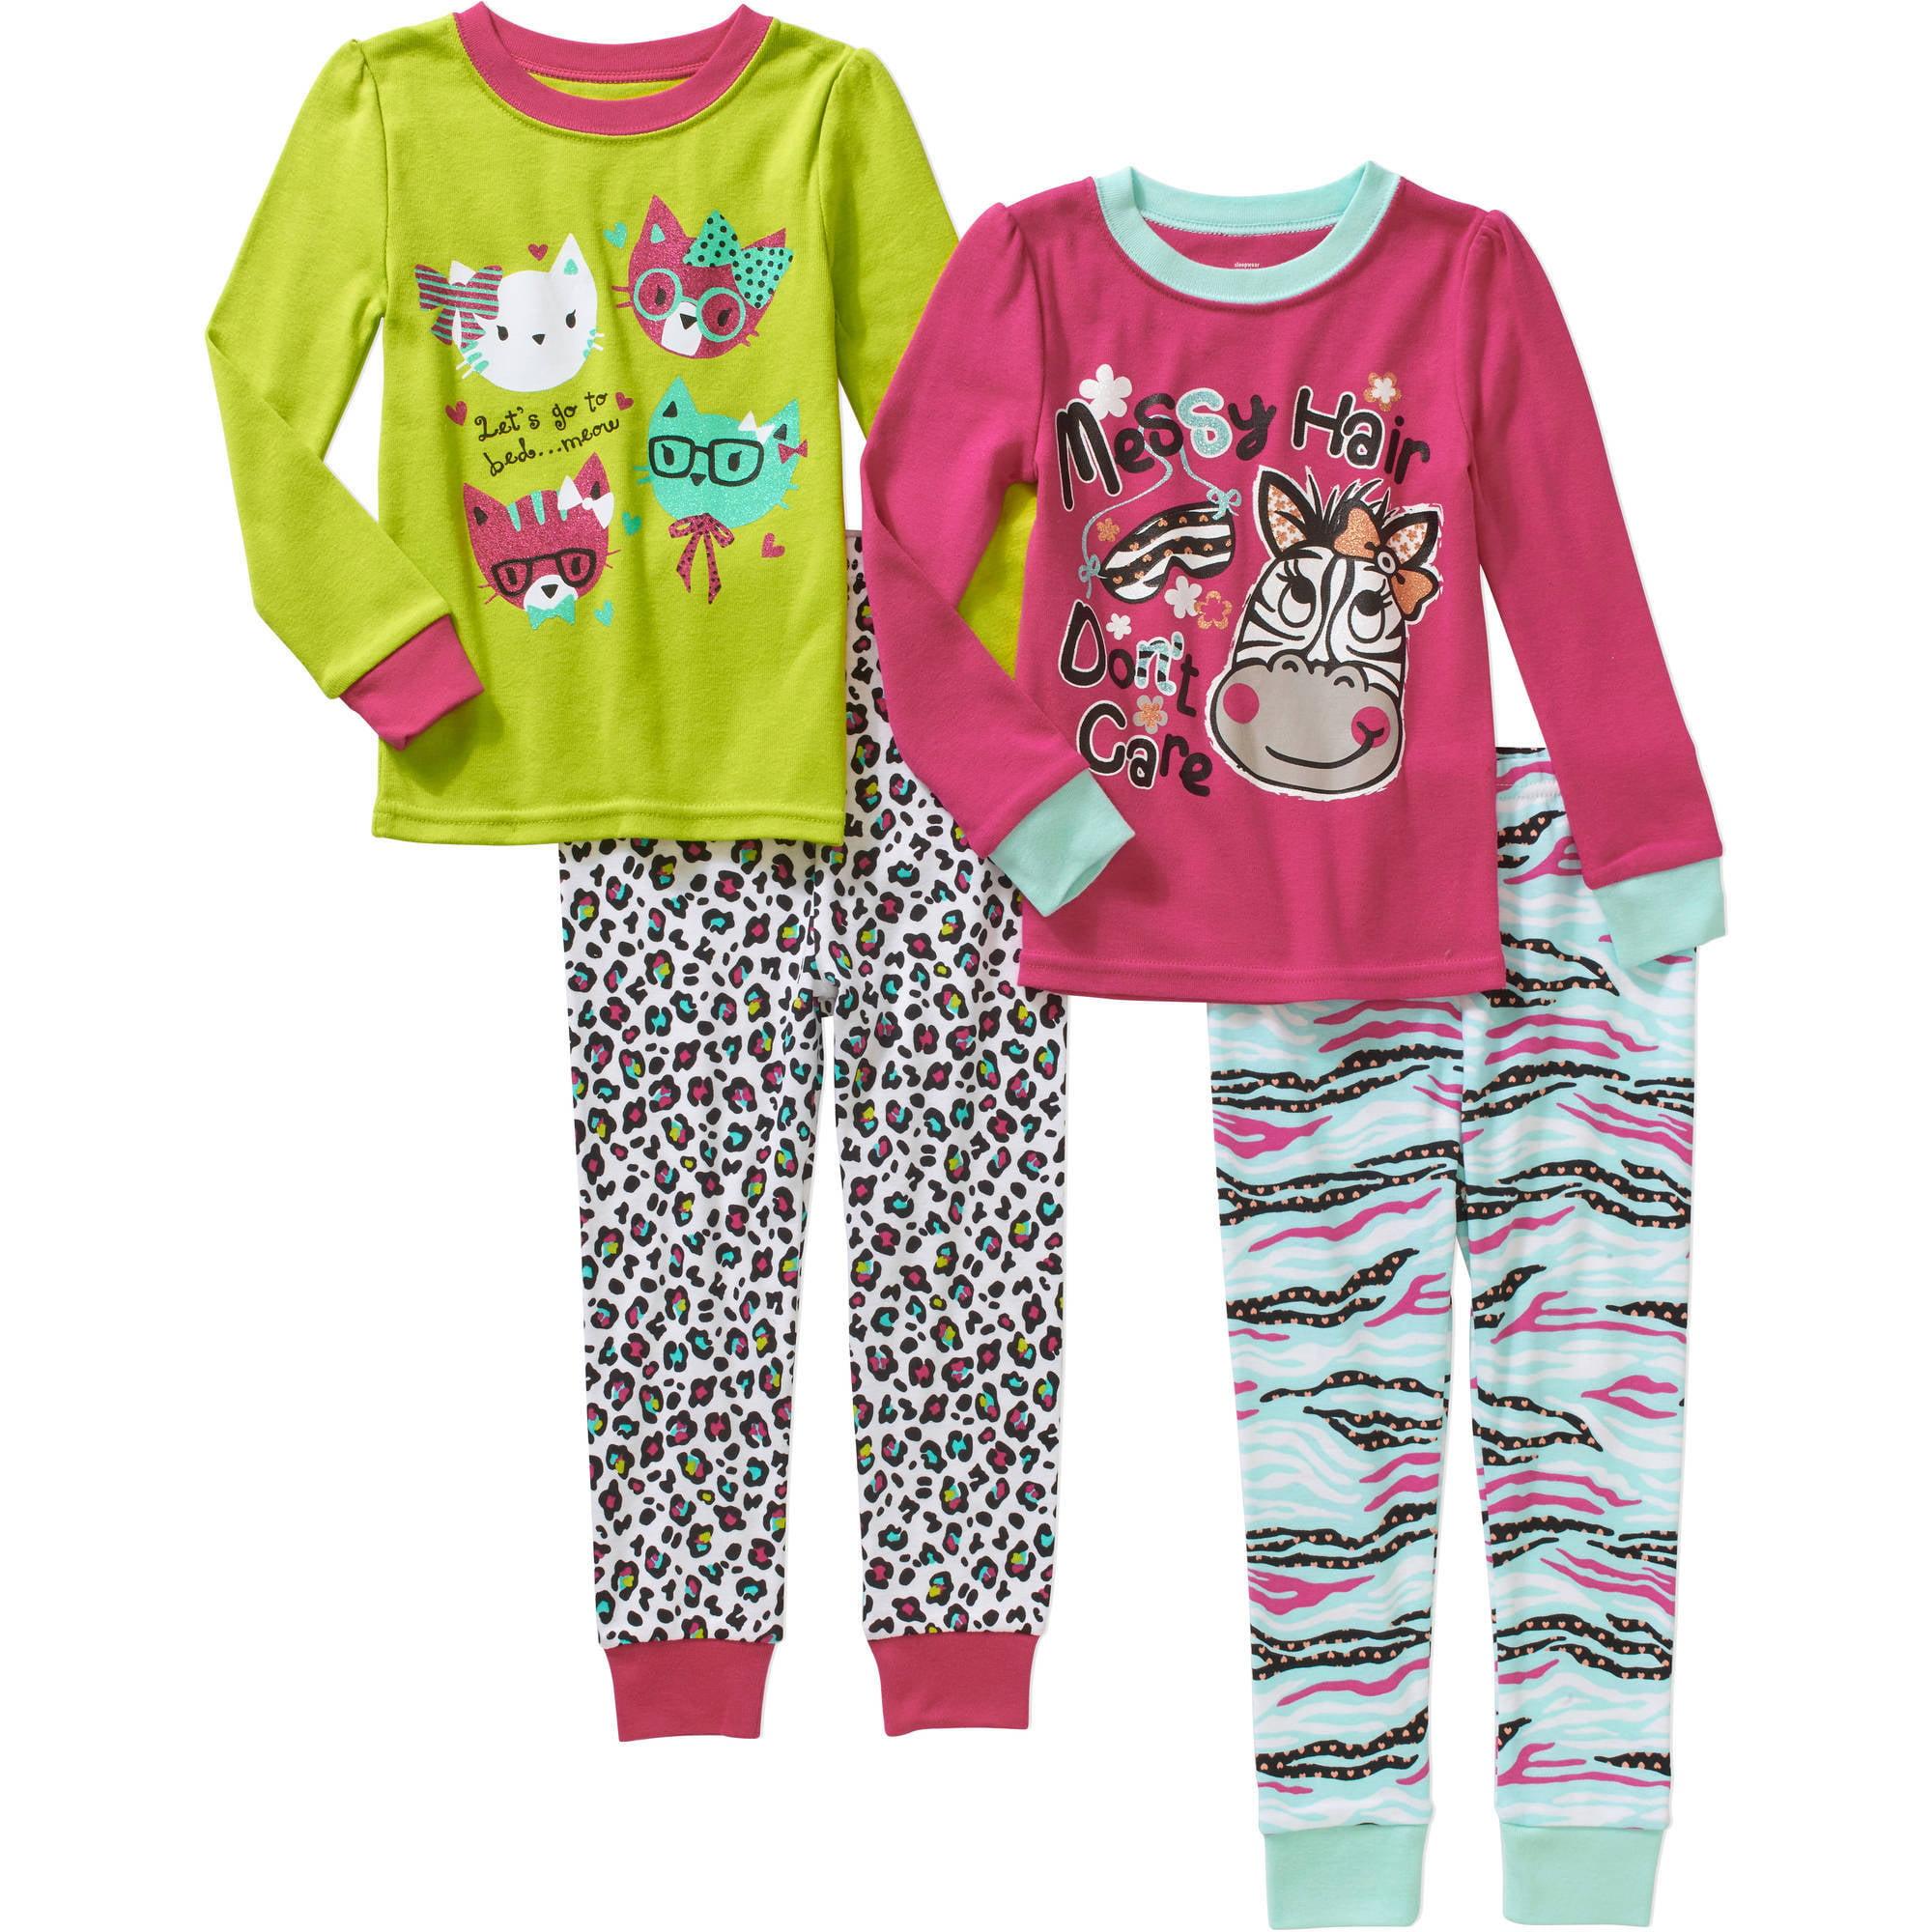 Baby Toddler Girl Cotton Tight Fit Pajamas, 4-piece set